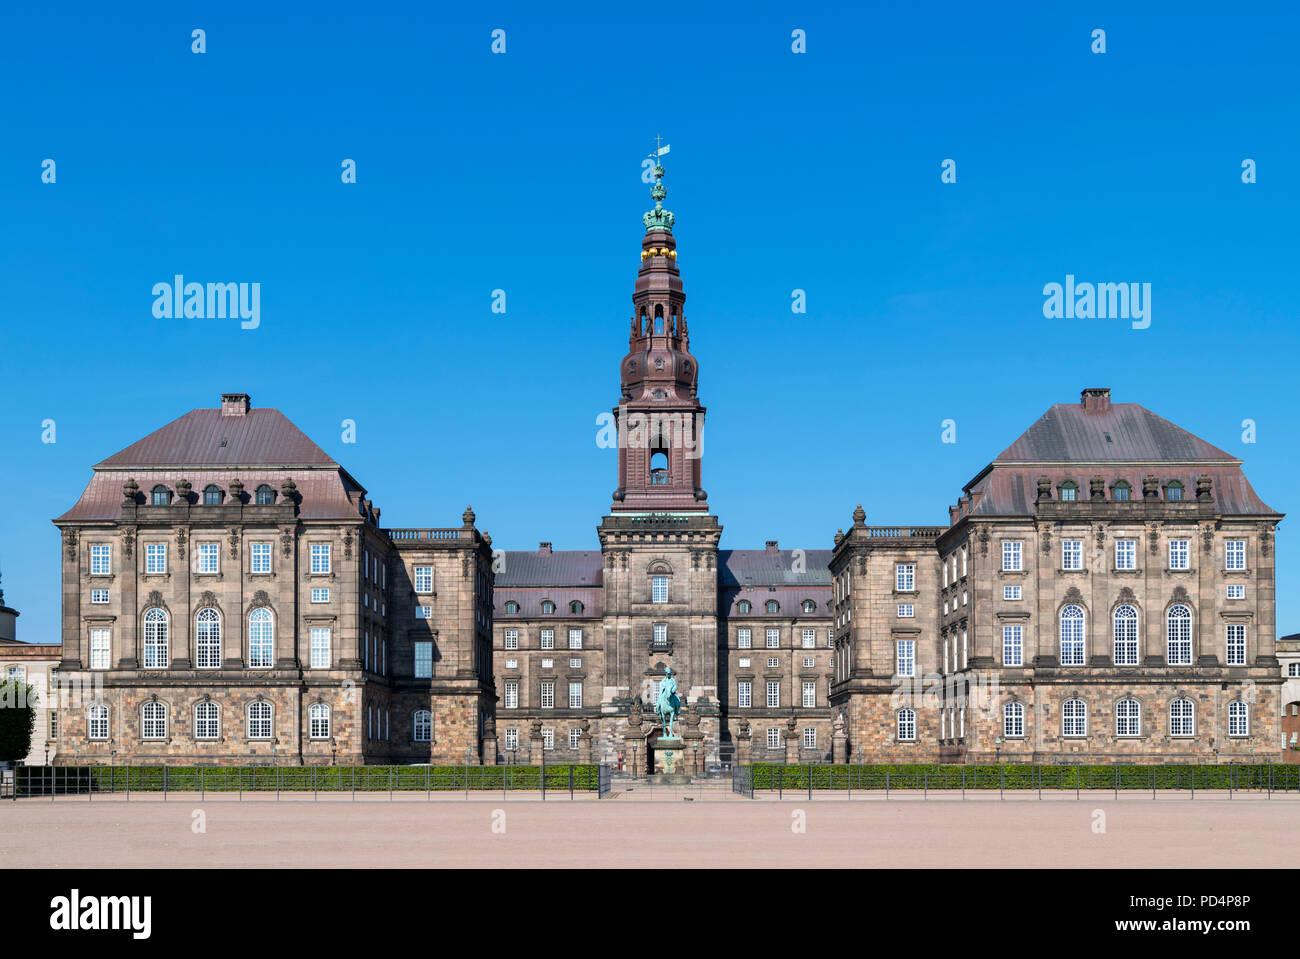 Rear of Christiansborg Slot (Christiansborg Palace), home to the Danish Parliament (Folketinget), Slotsholmen, Copenhagen, Denmark - Stock Image